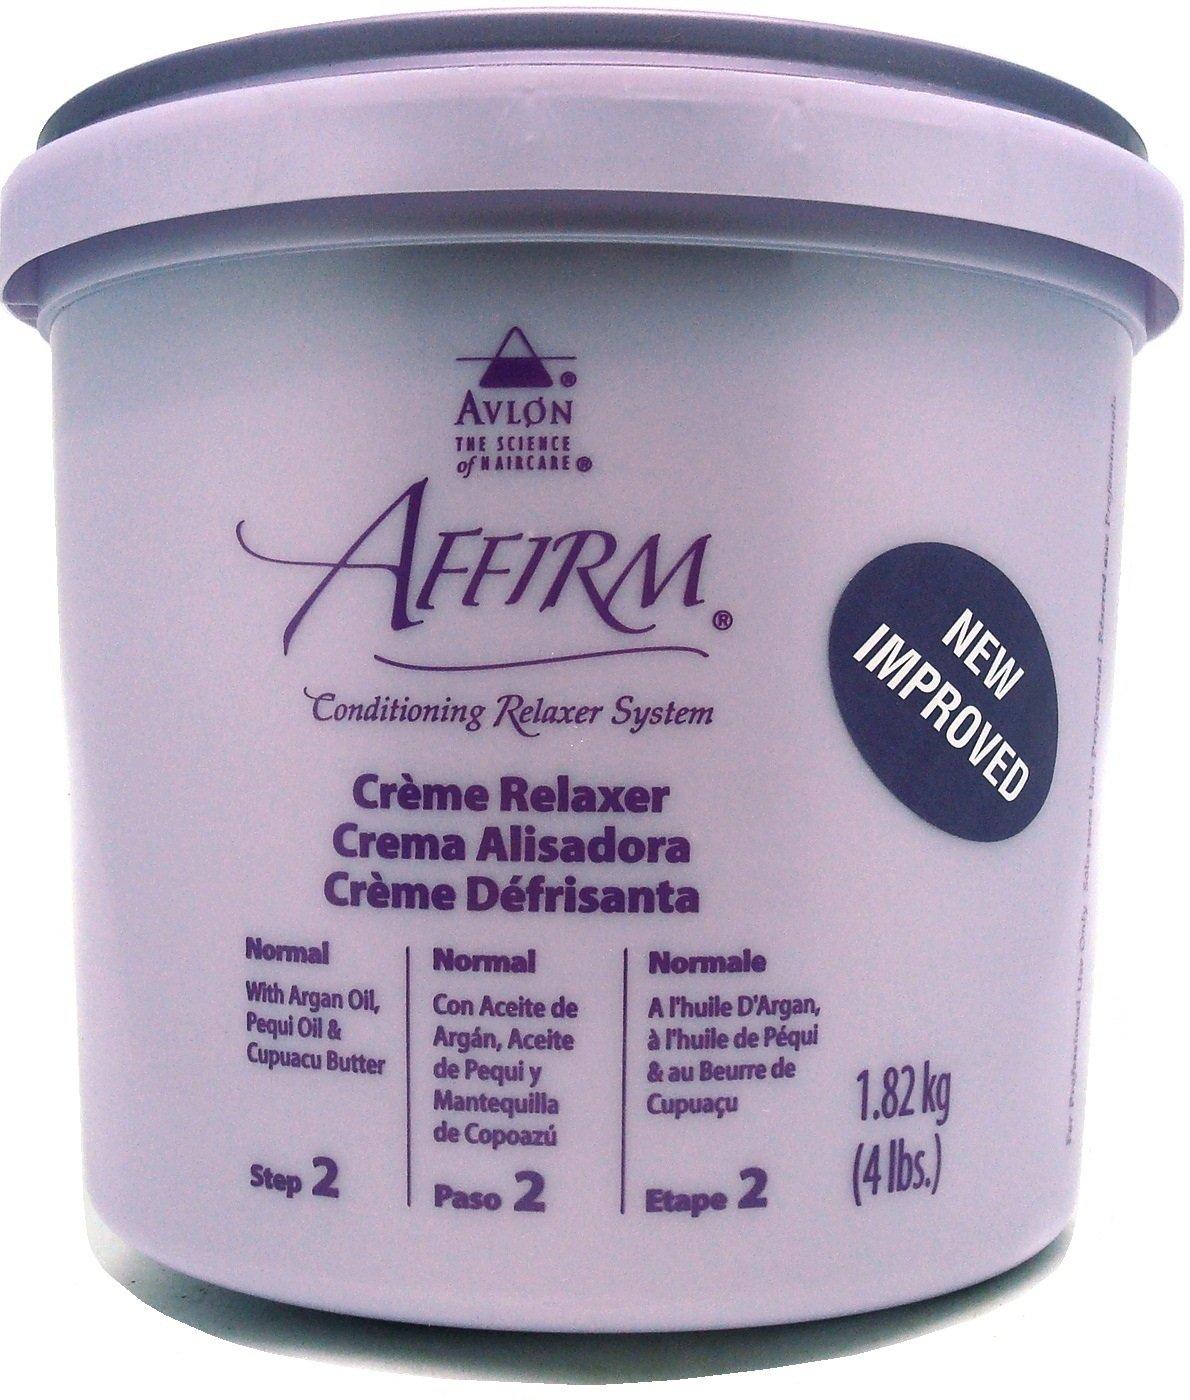 Avlon Affirm Creme Relaxer Normal Tratamiento Capilar - 300 ml 0796708160022